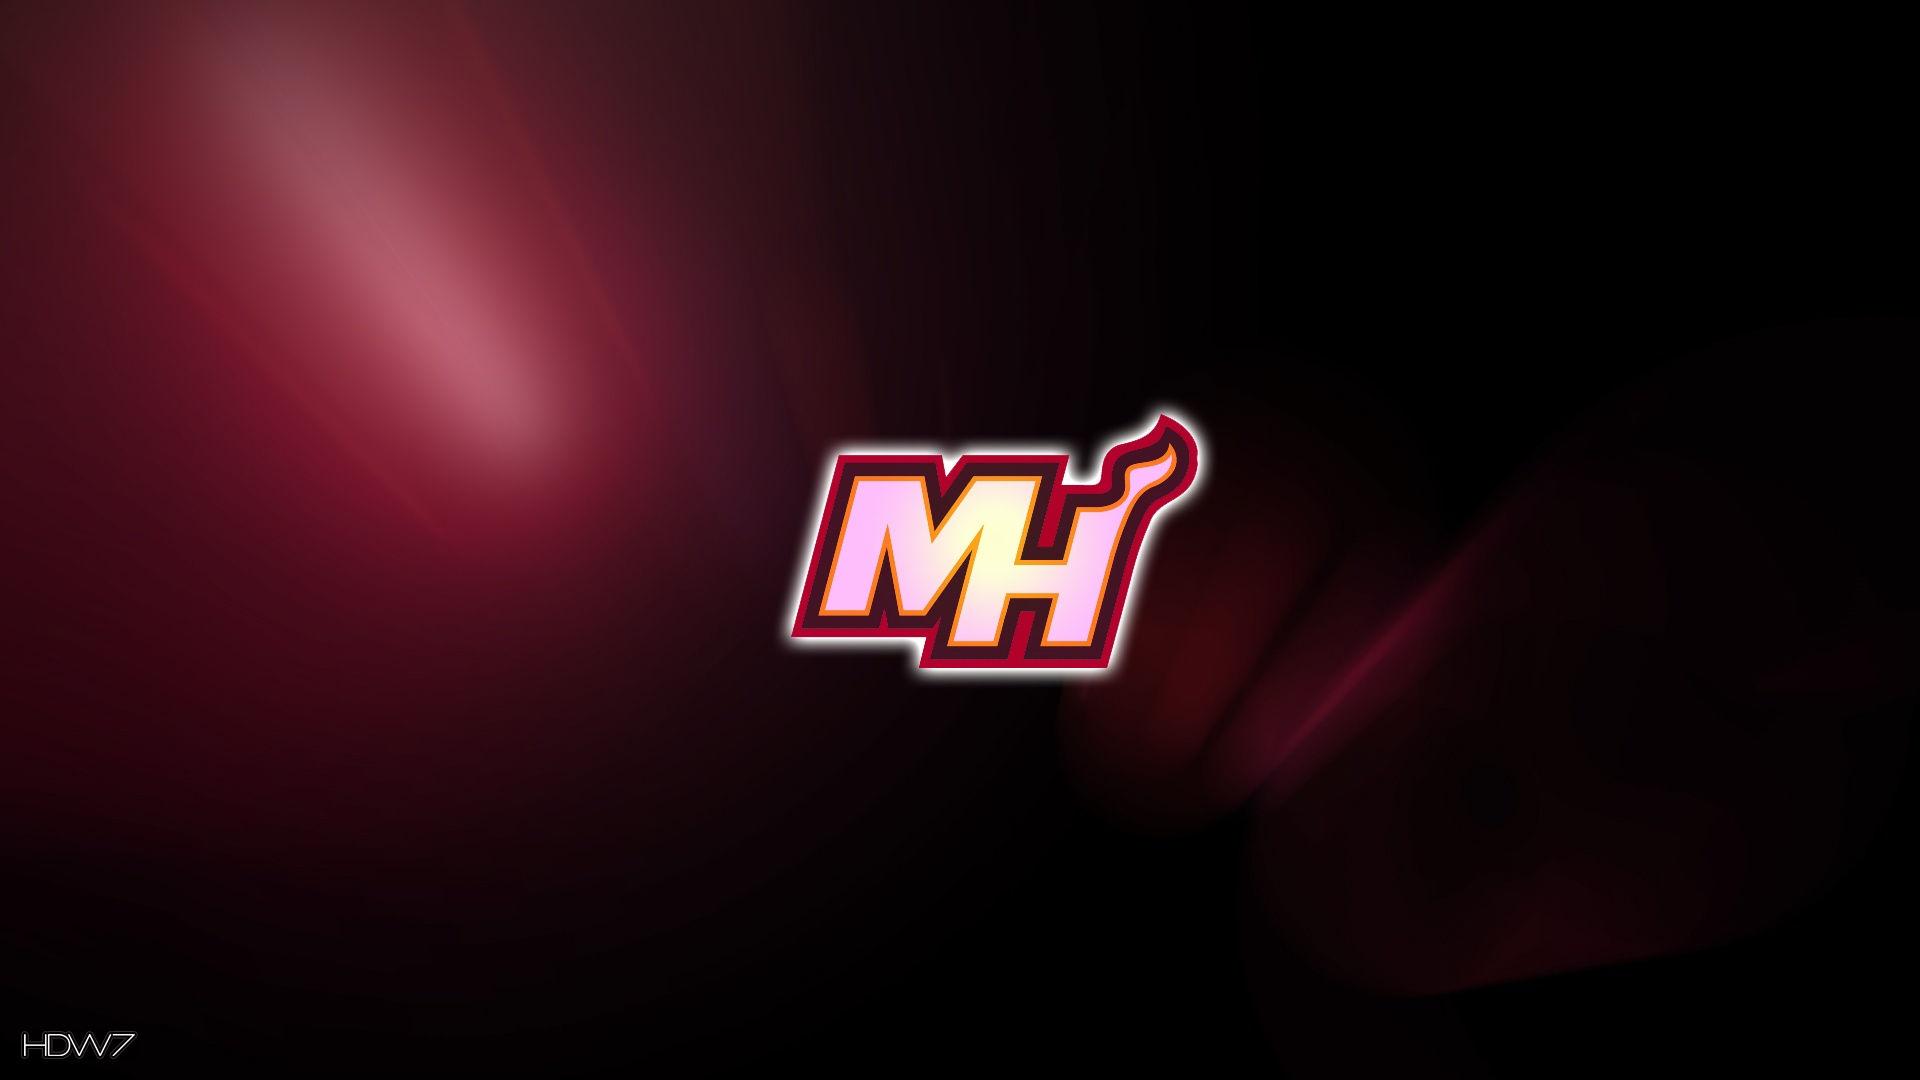 miami heat mh background hd wallpaper HD wallpaper gallery 303 1920x1080